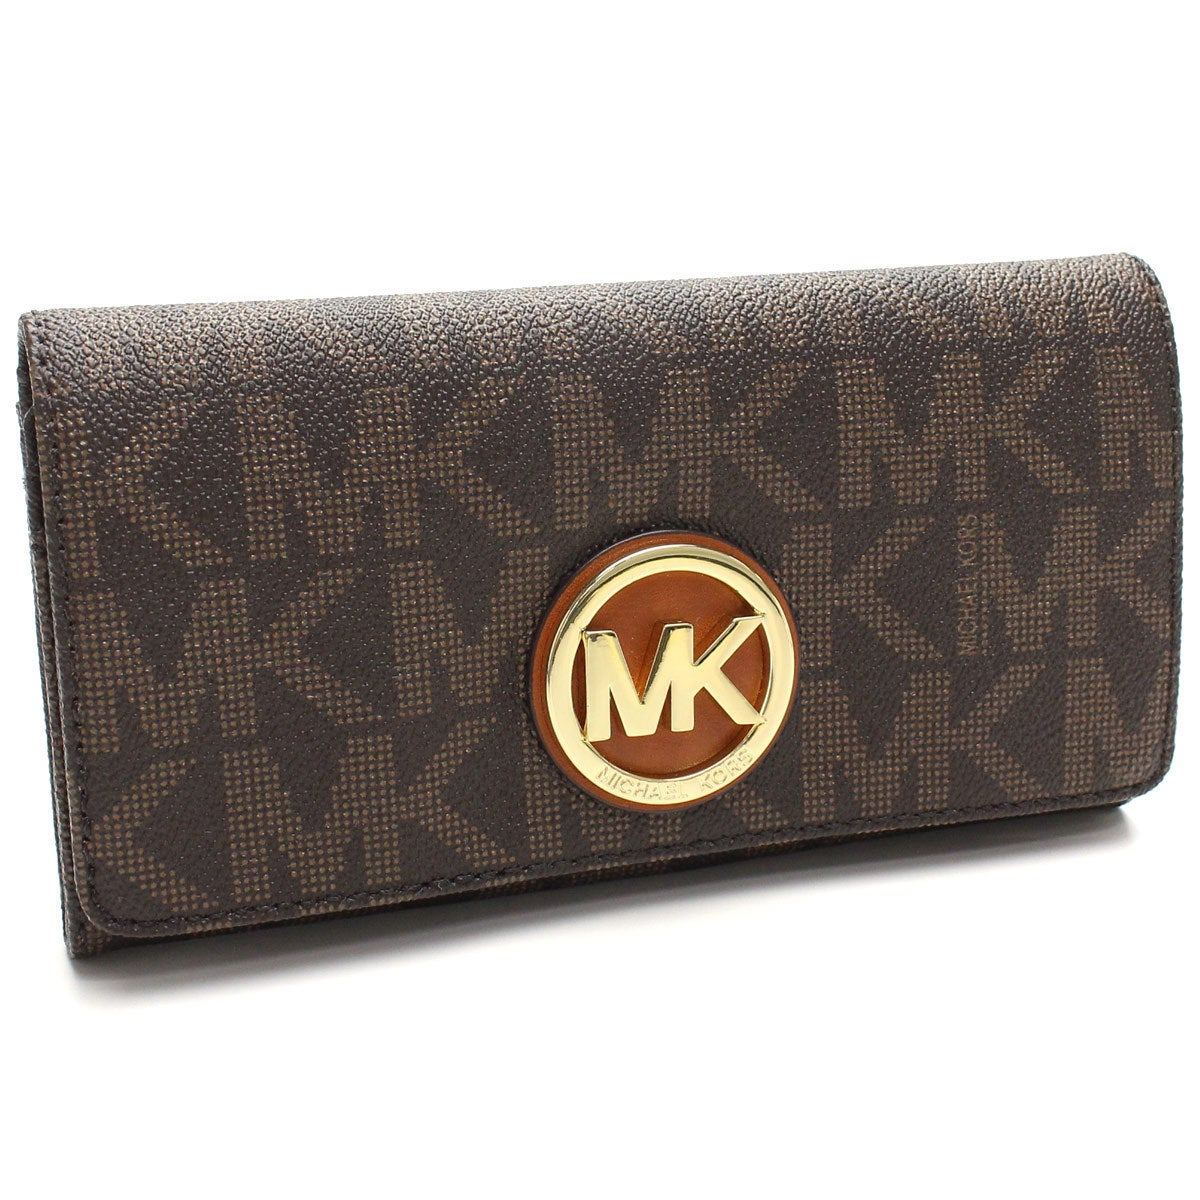 66acf72a0571 Shop Michael Kors Fulton Brown Logo/Gold Carryall Wallet - Free ...